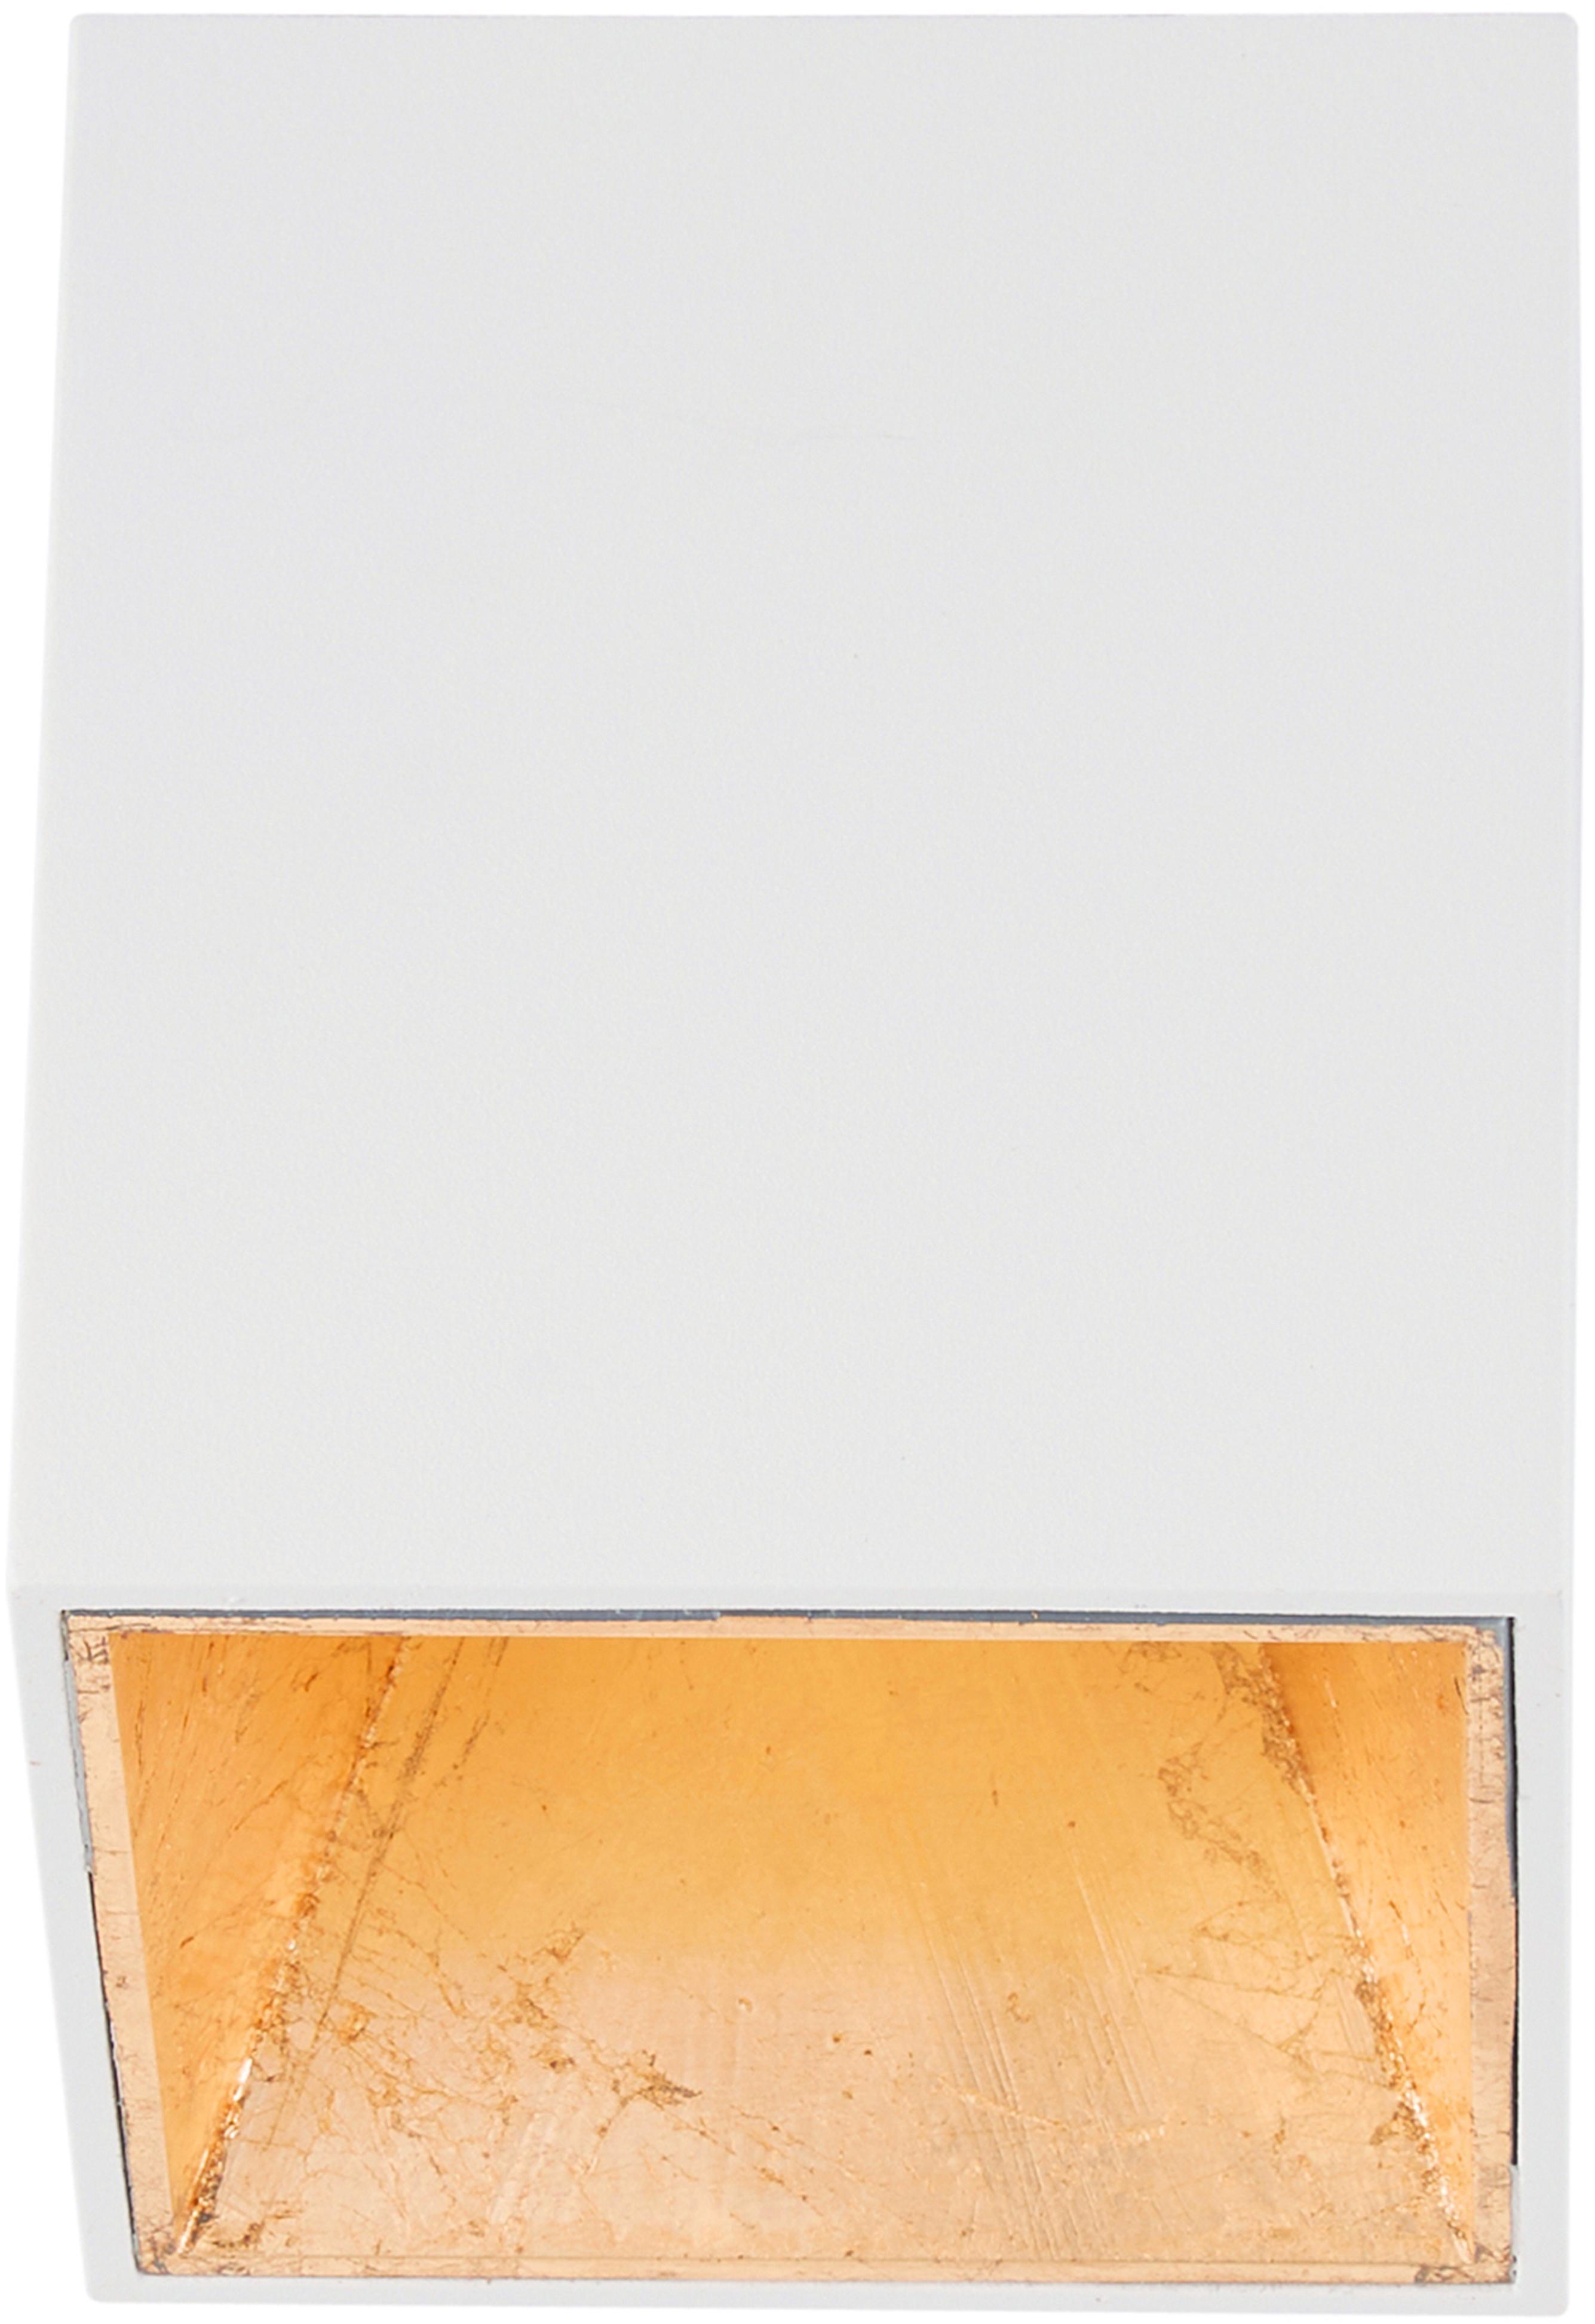 Plafondlamp Marty, Wit, goudkleurig, 10 x 12 cm